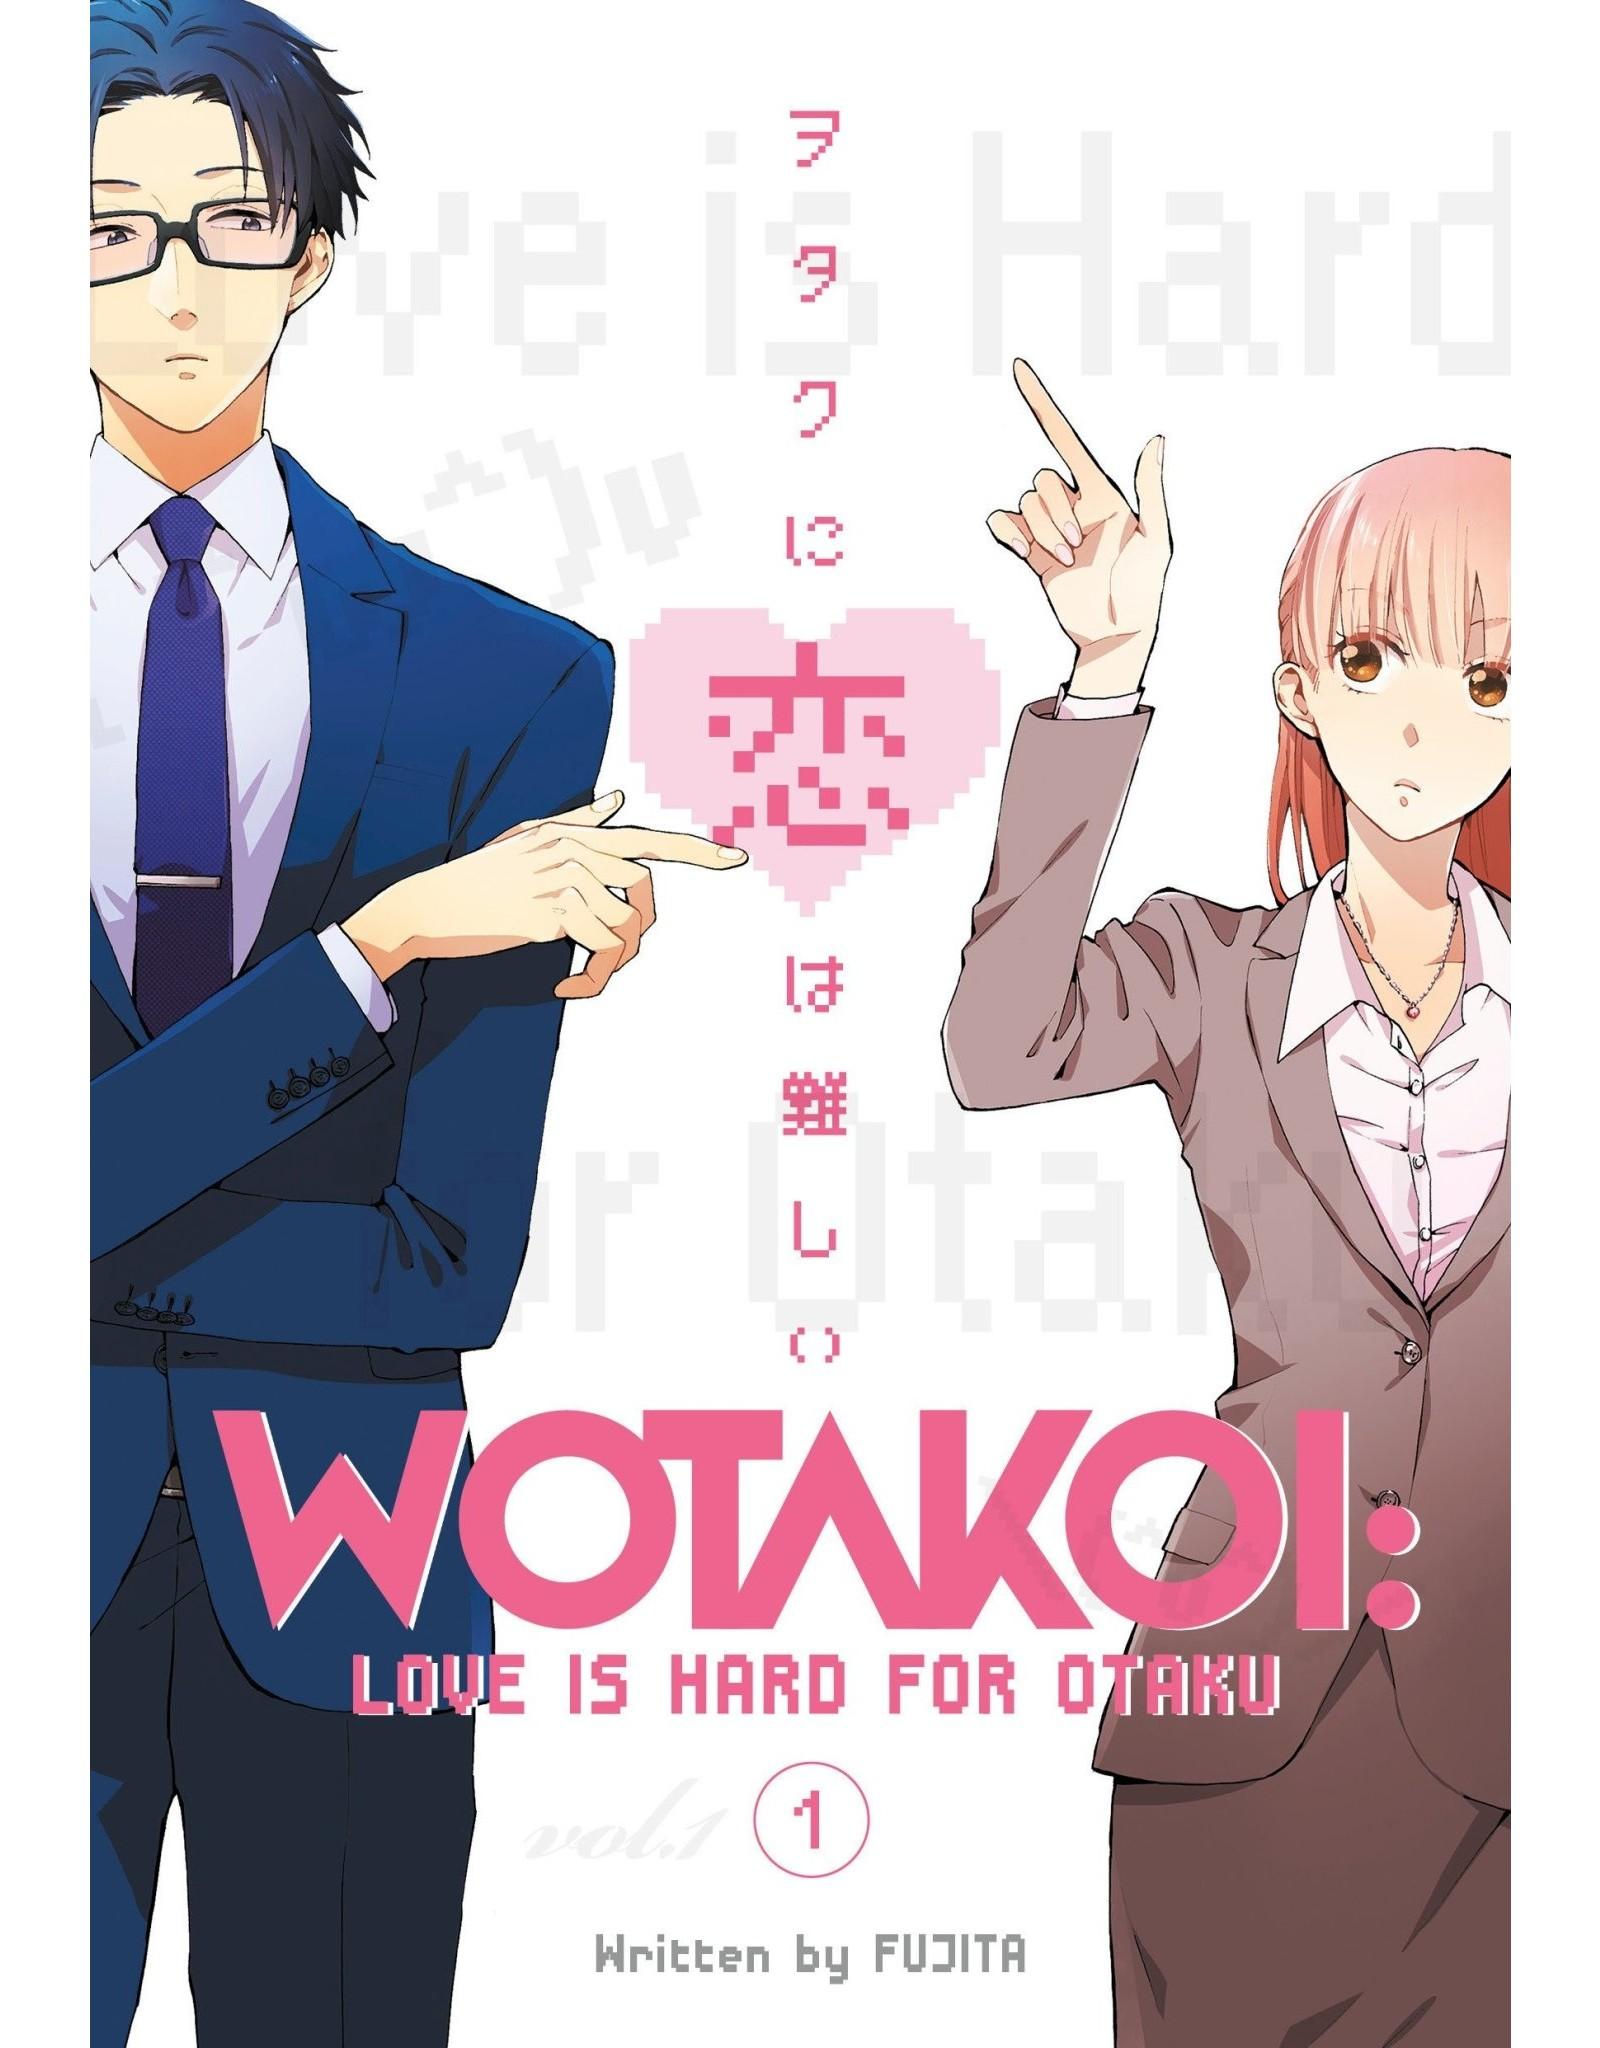 Wotakoi: Love is Hard for Otaku 1 (English)